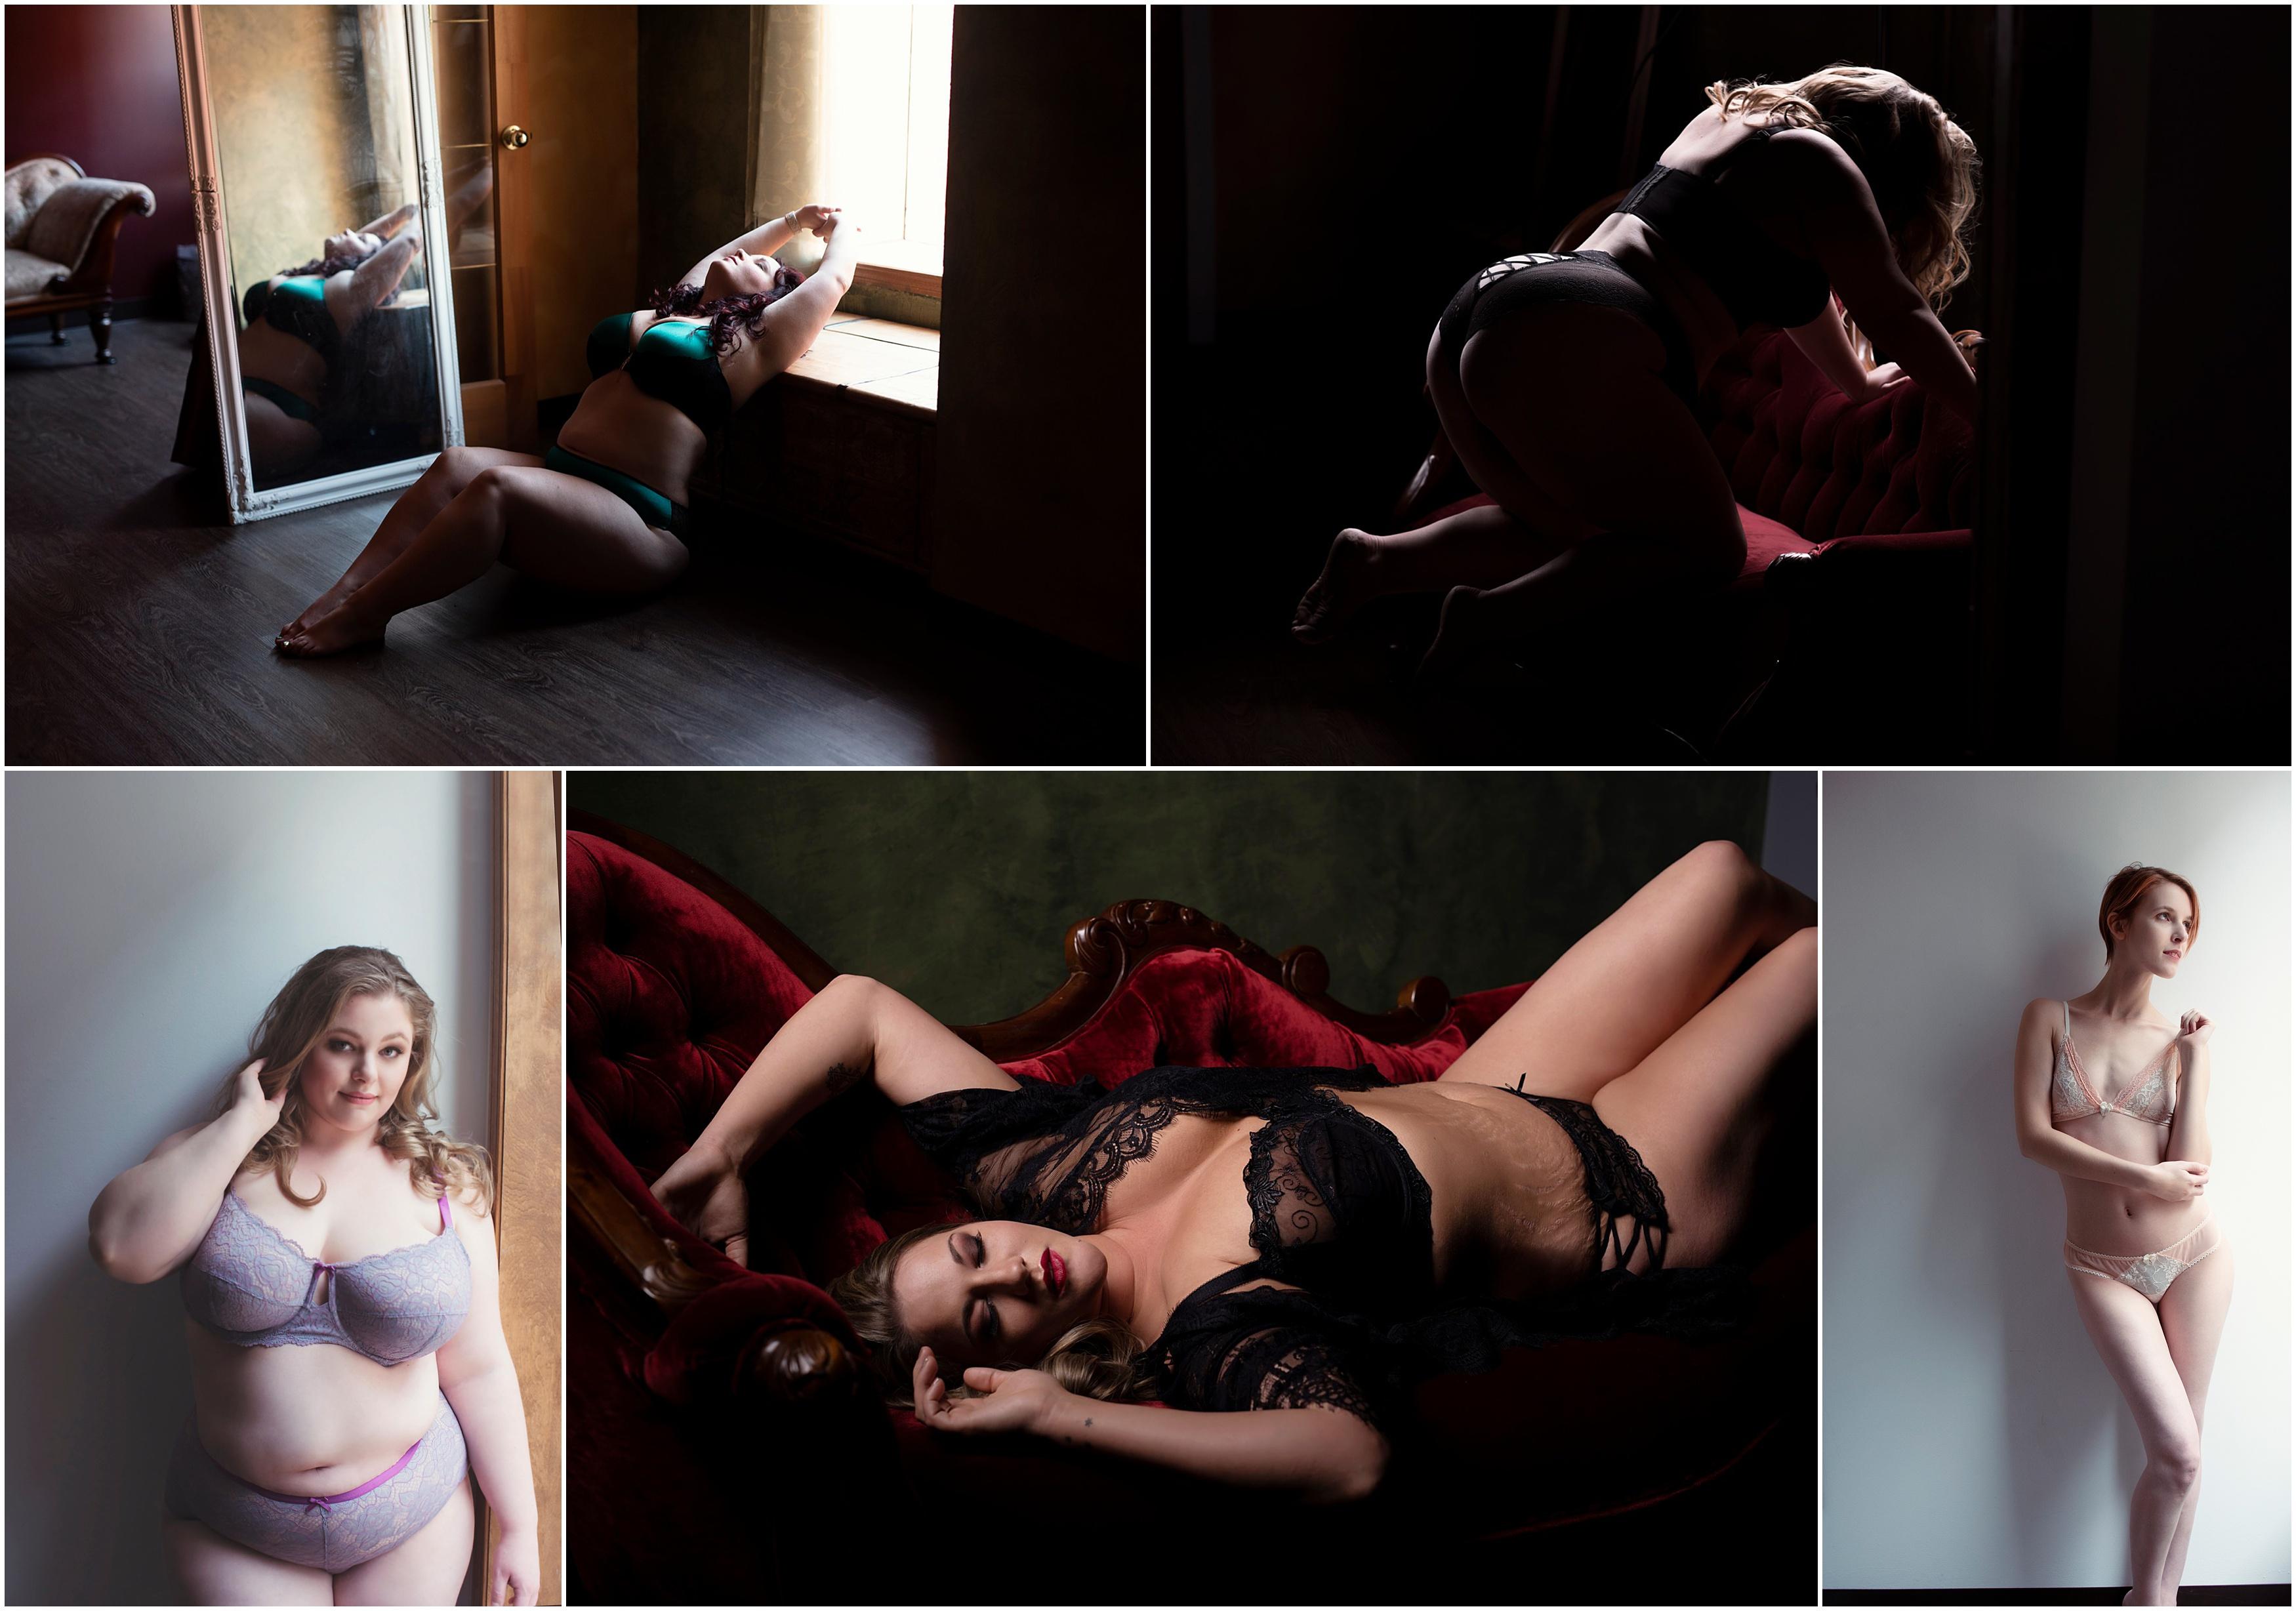 What-to-wear-for-boudoir-photoshoot_bra-panties-set